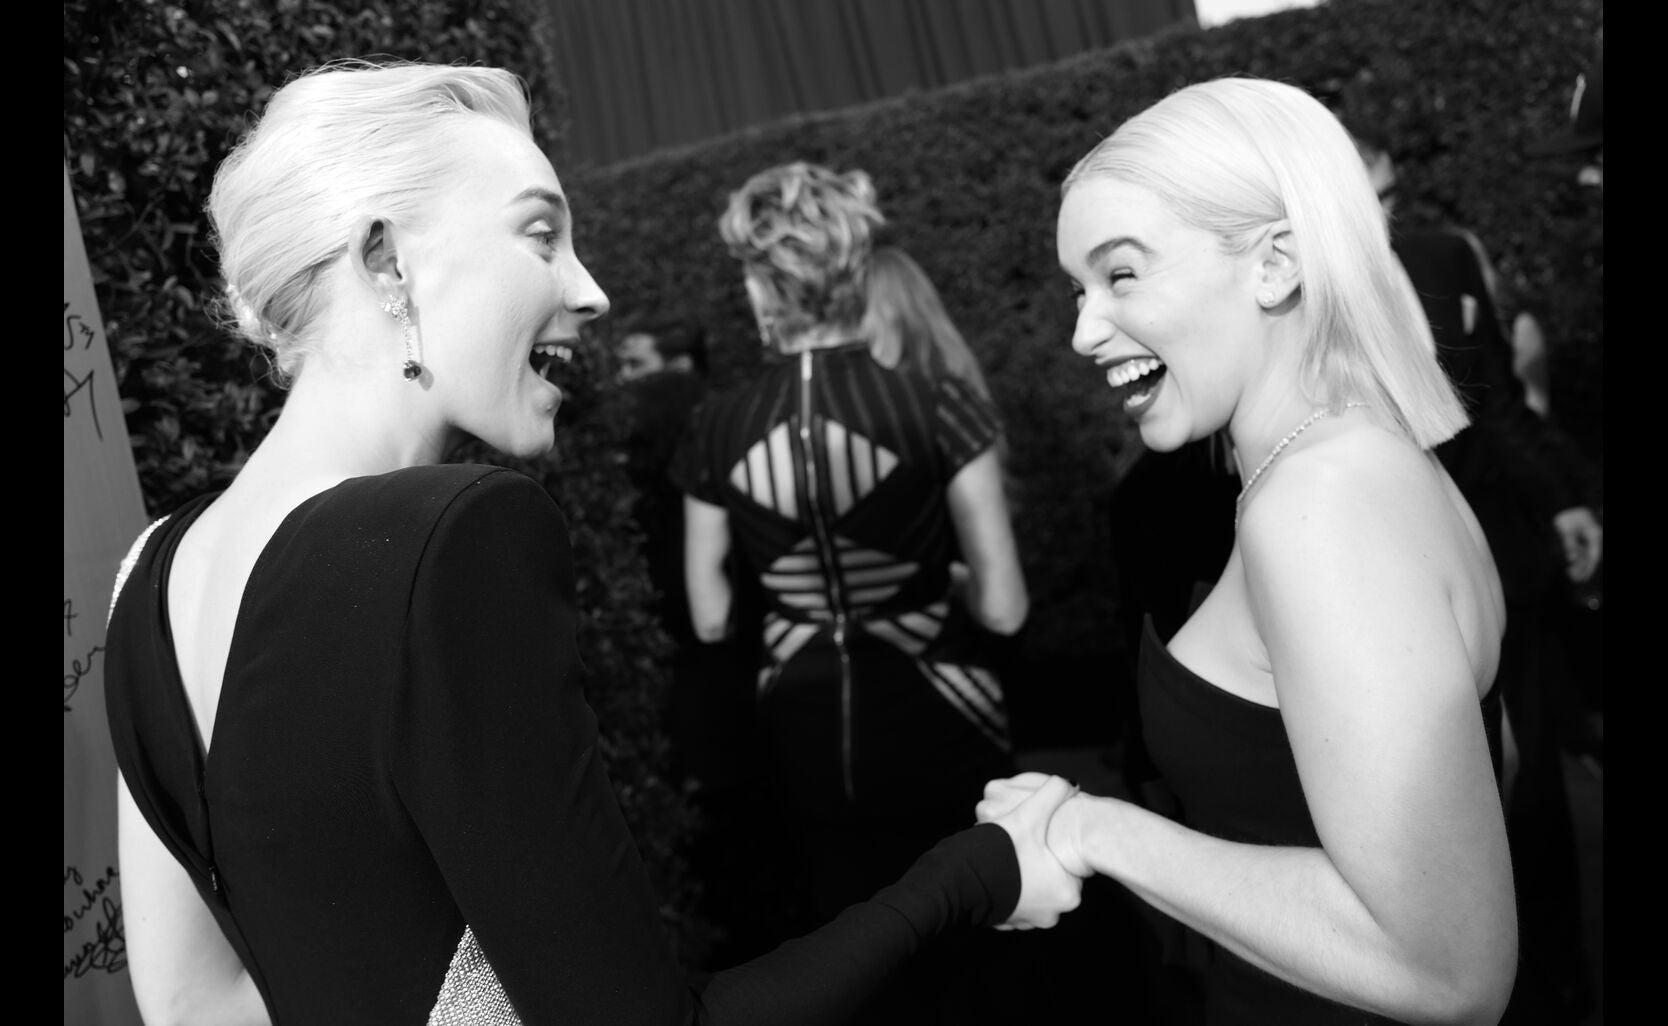 Saoirse Ronan and Emilia Clarke